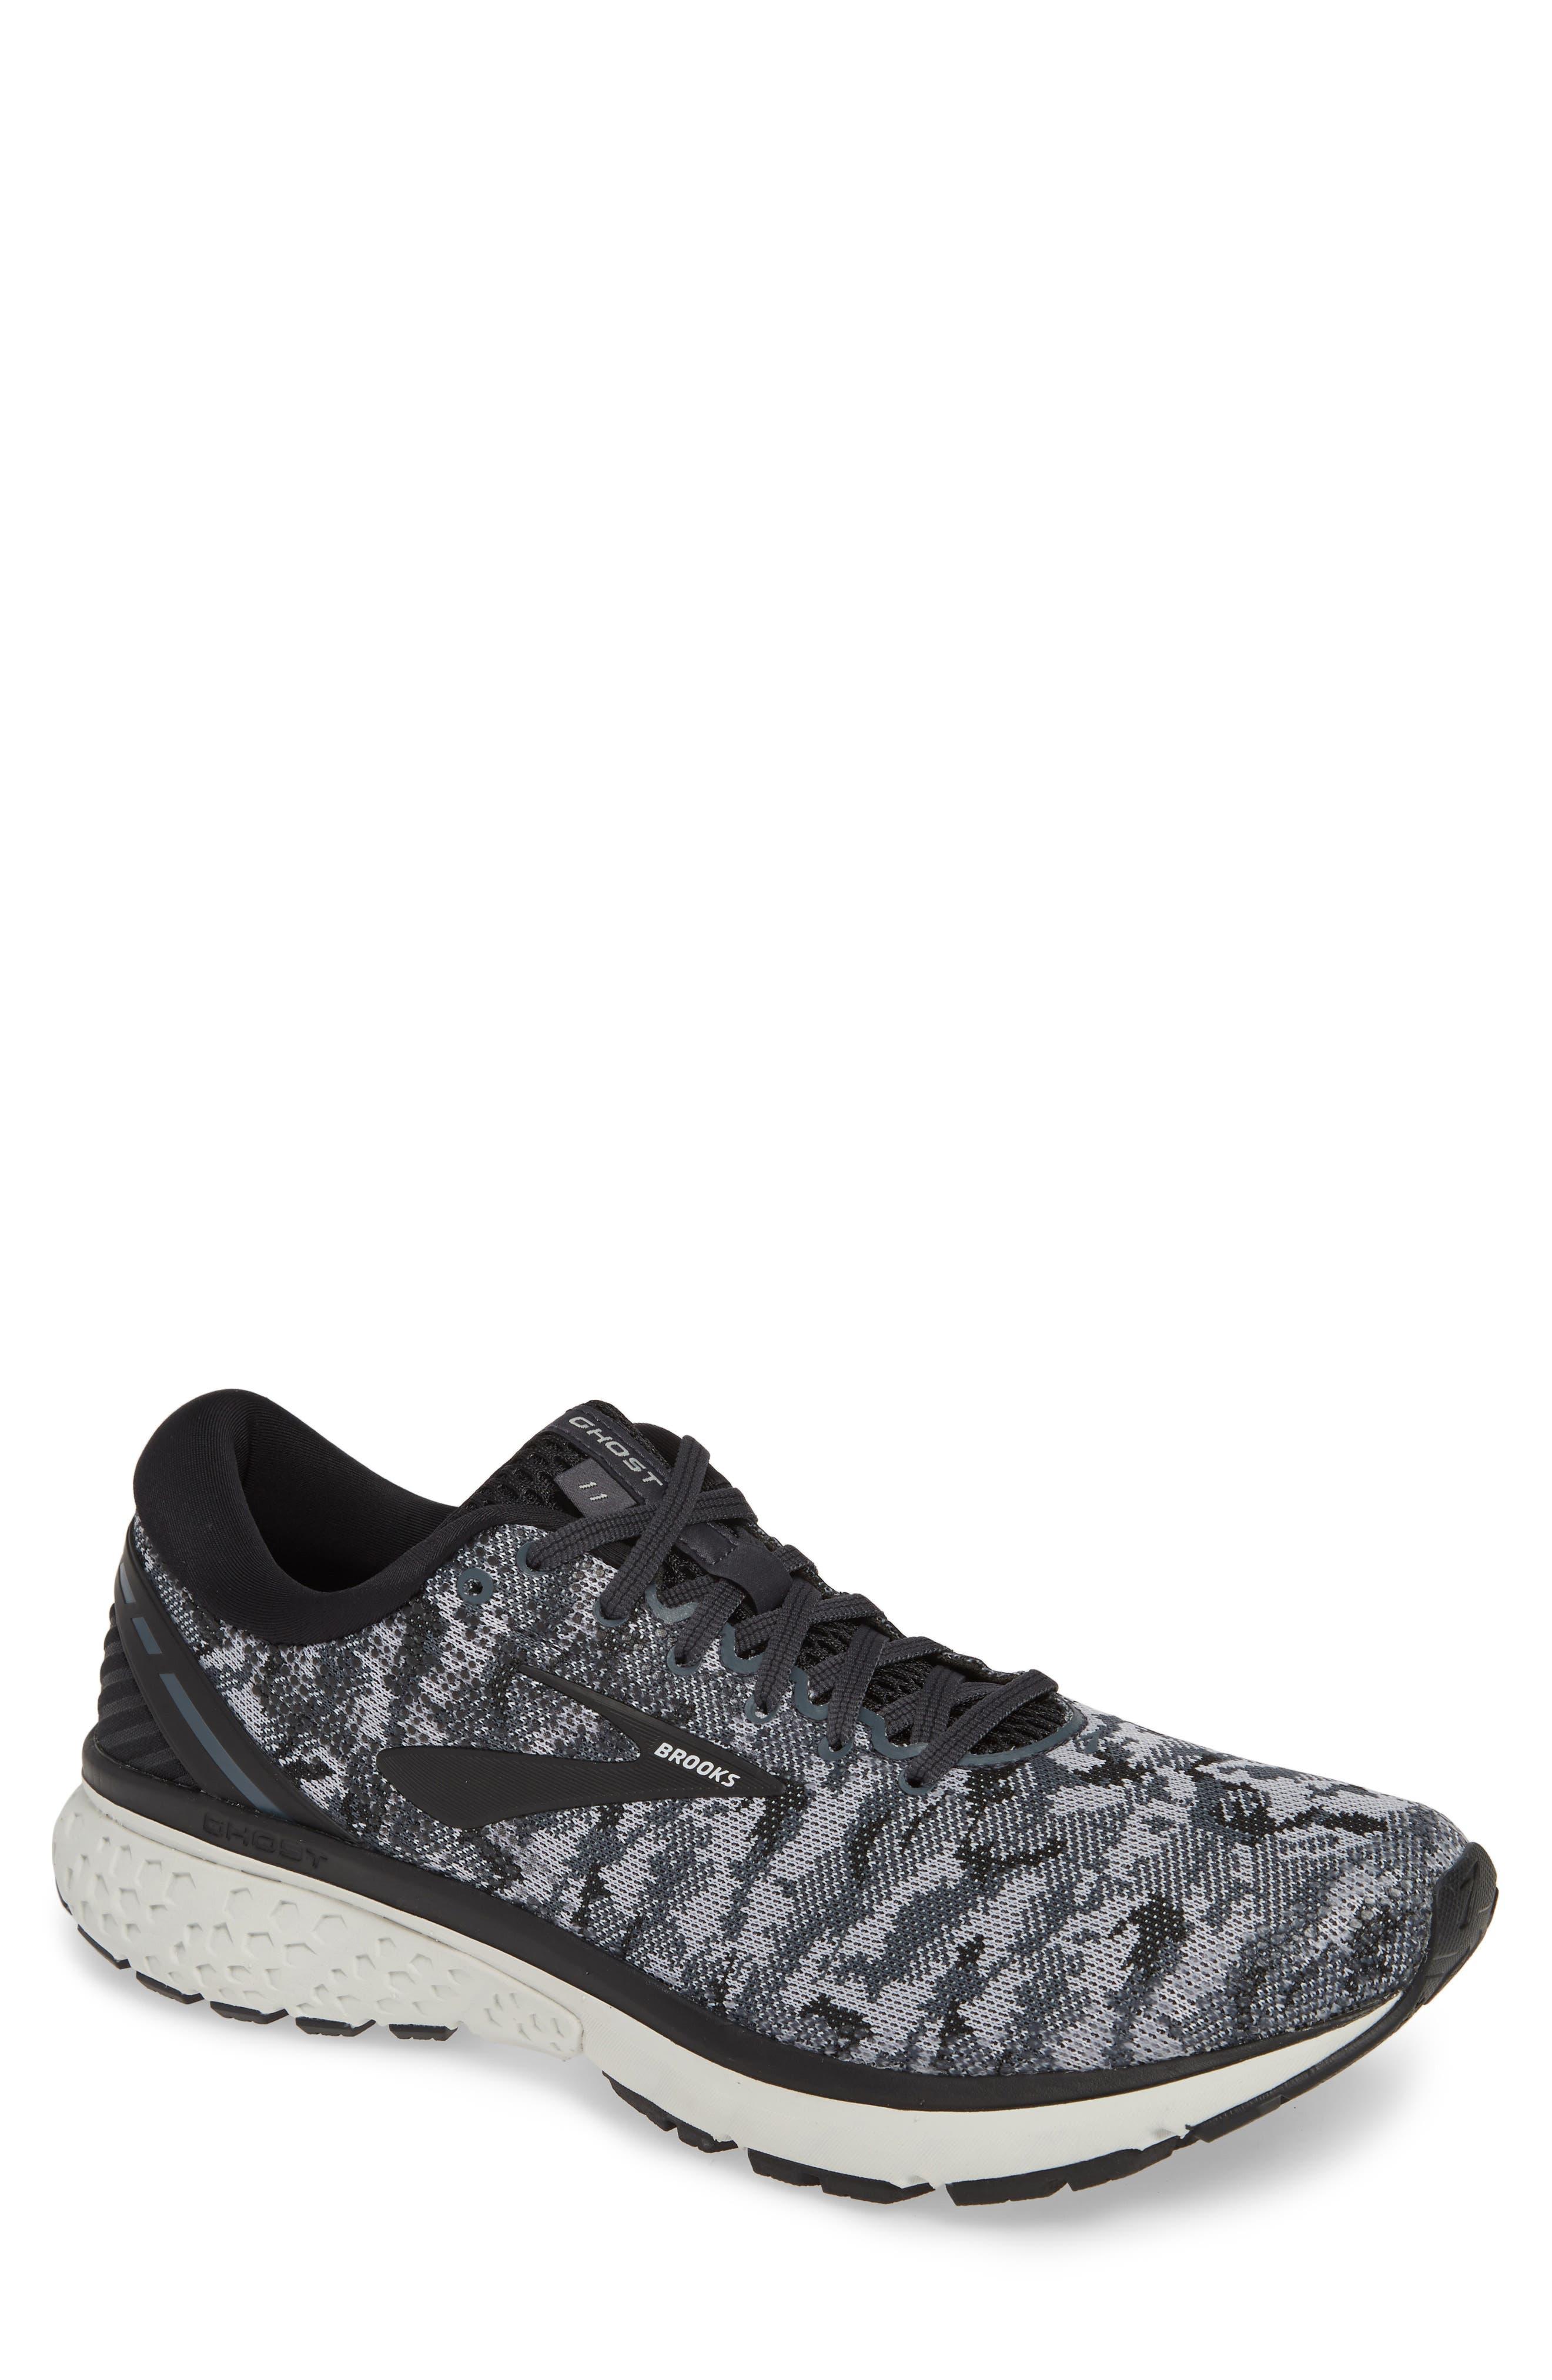 Brooks Ghost 11 Running Shoe - Grey